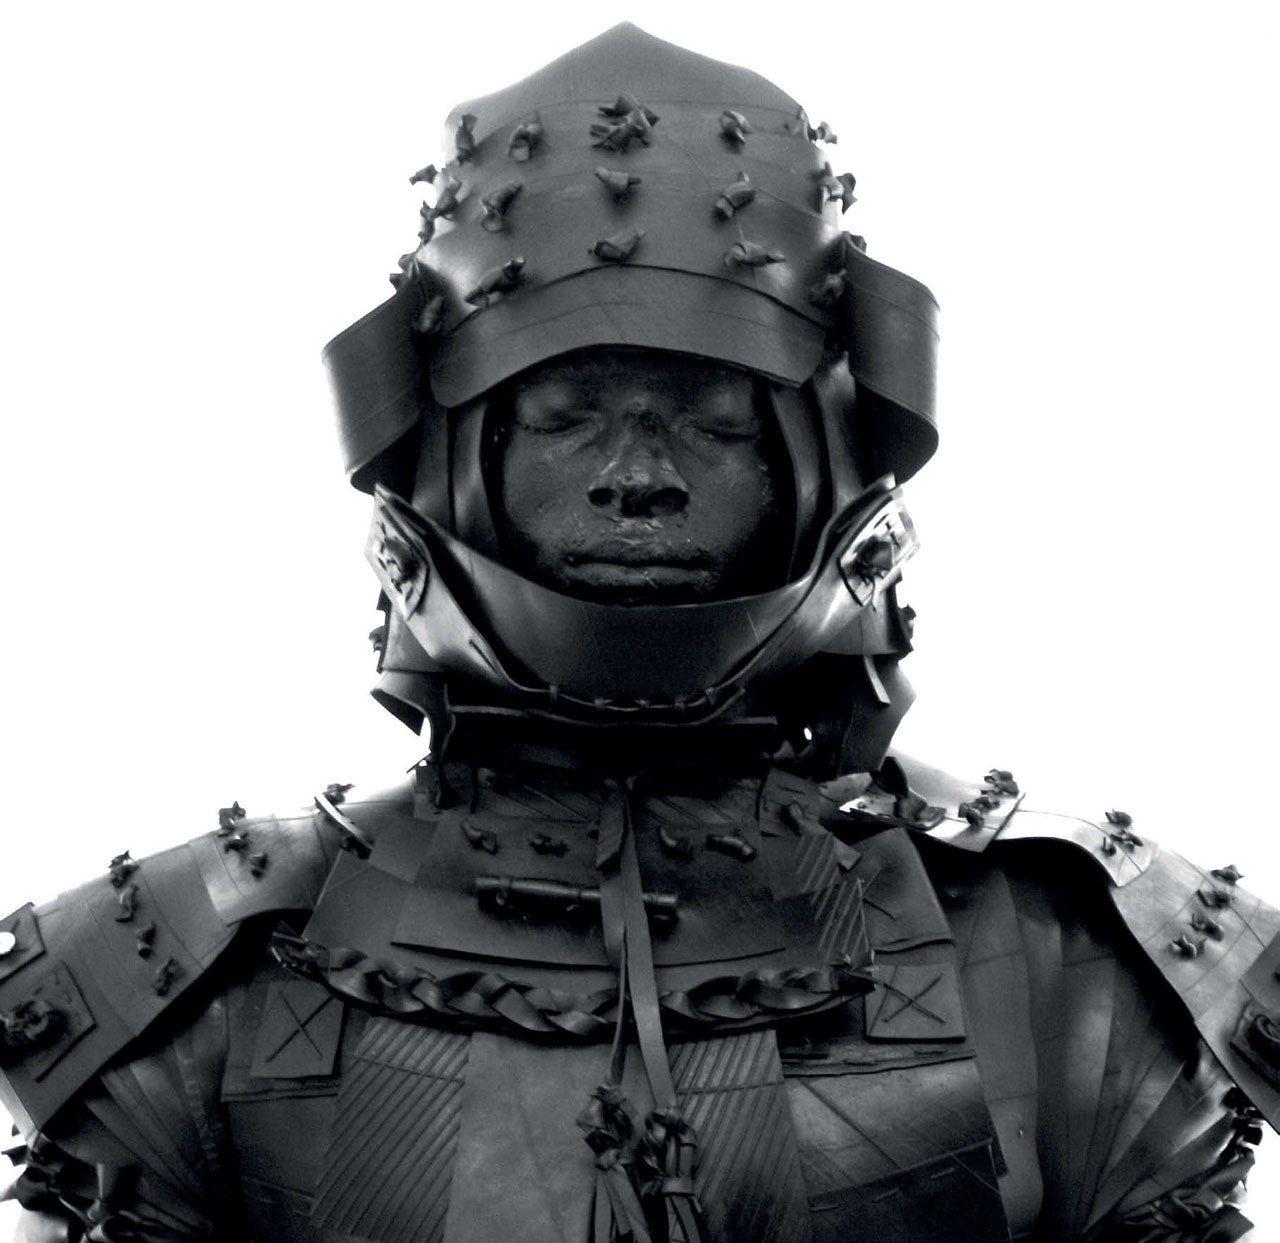 Yasuke, First Black Samurai, Black Samurai, KOLUMN Magazine, KOLUMN | African origins, Samurai, Black history facts